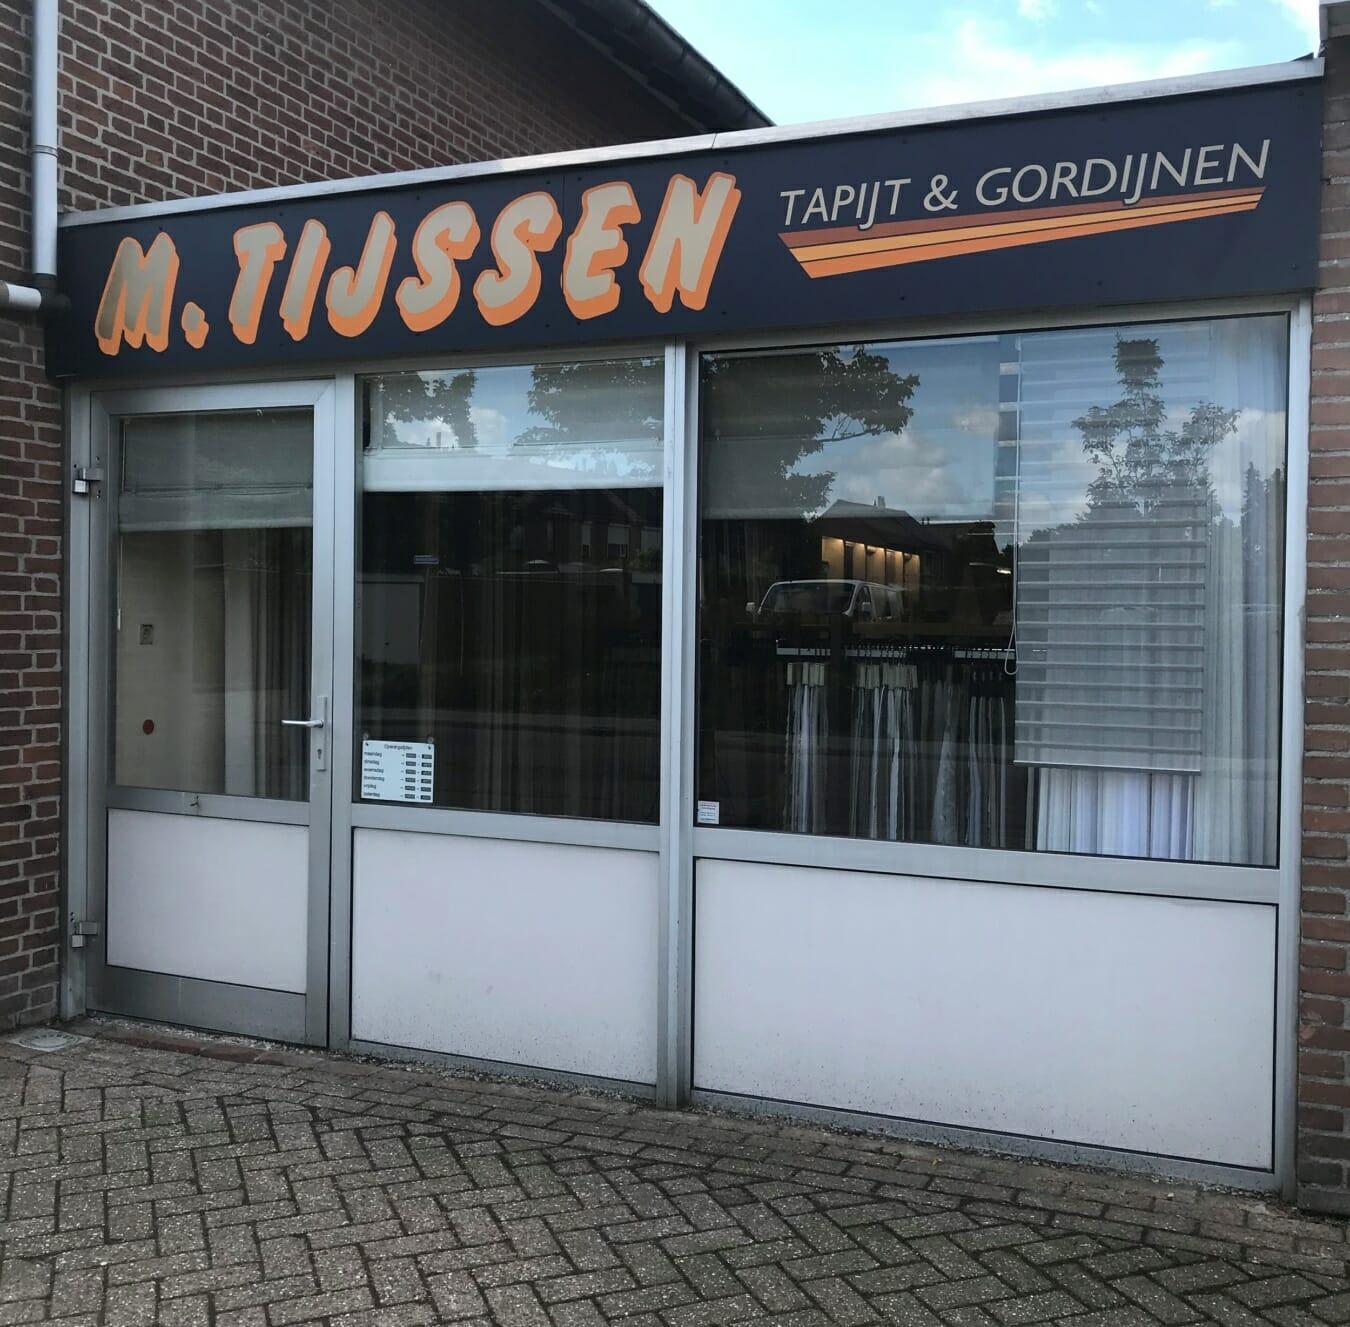 Tapijthal Tijssen - winkelpand